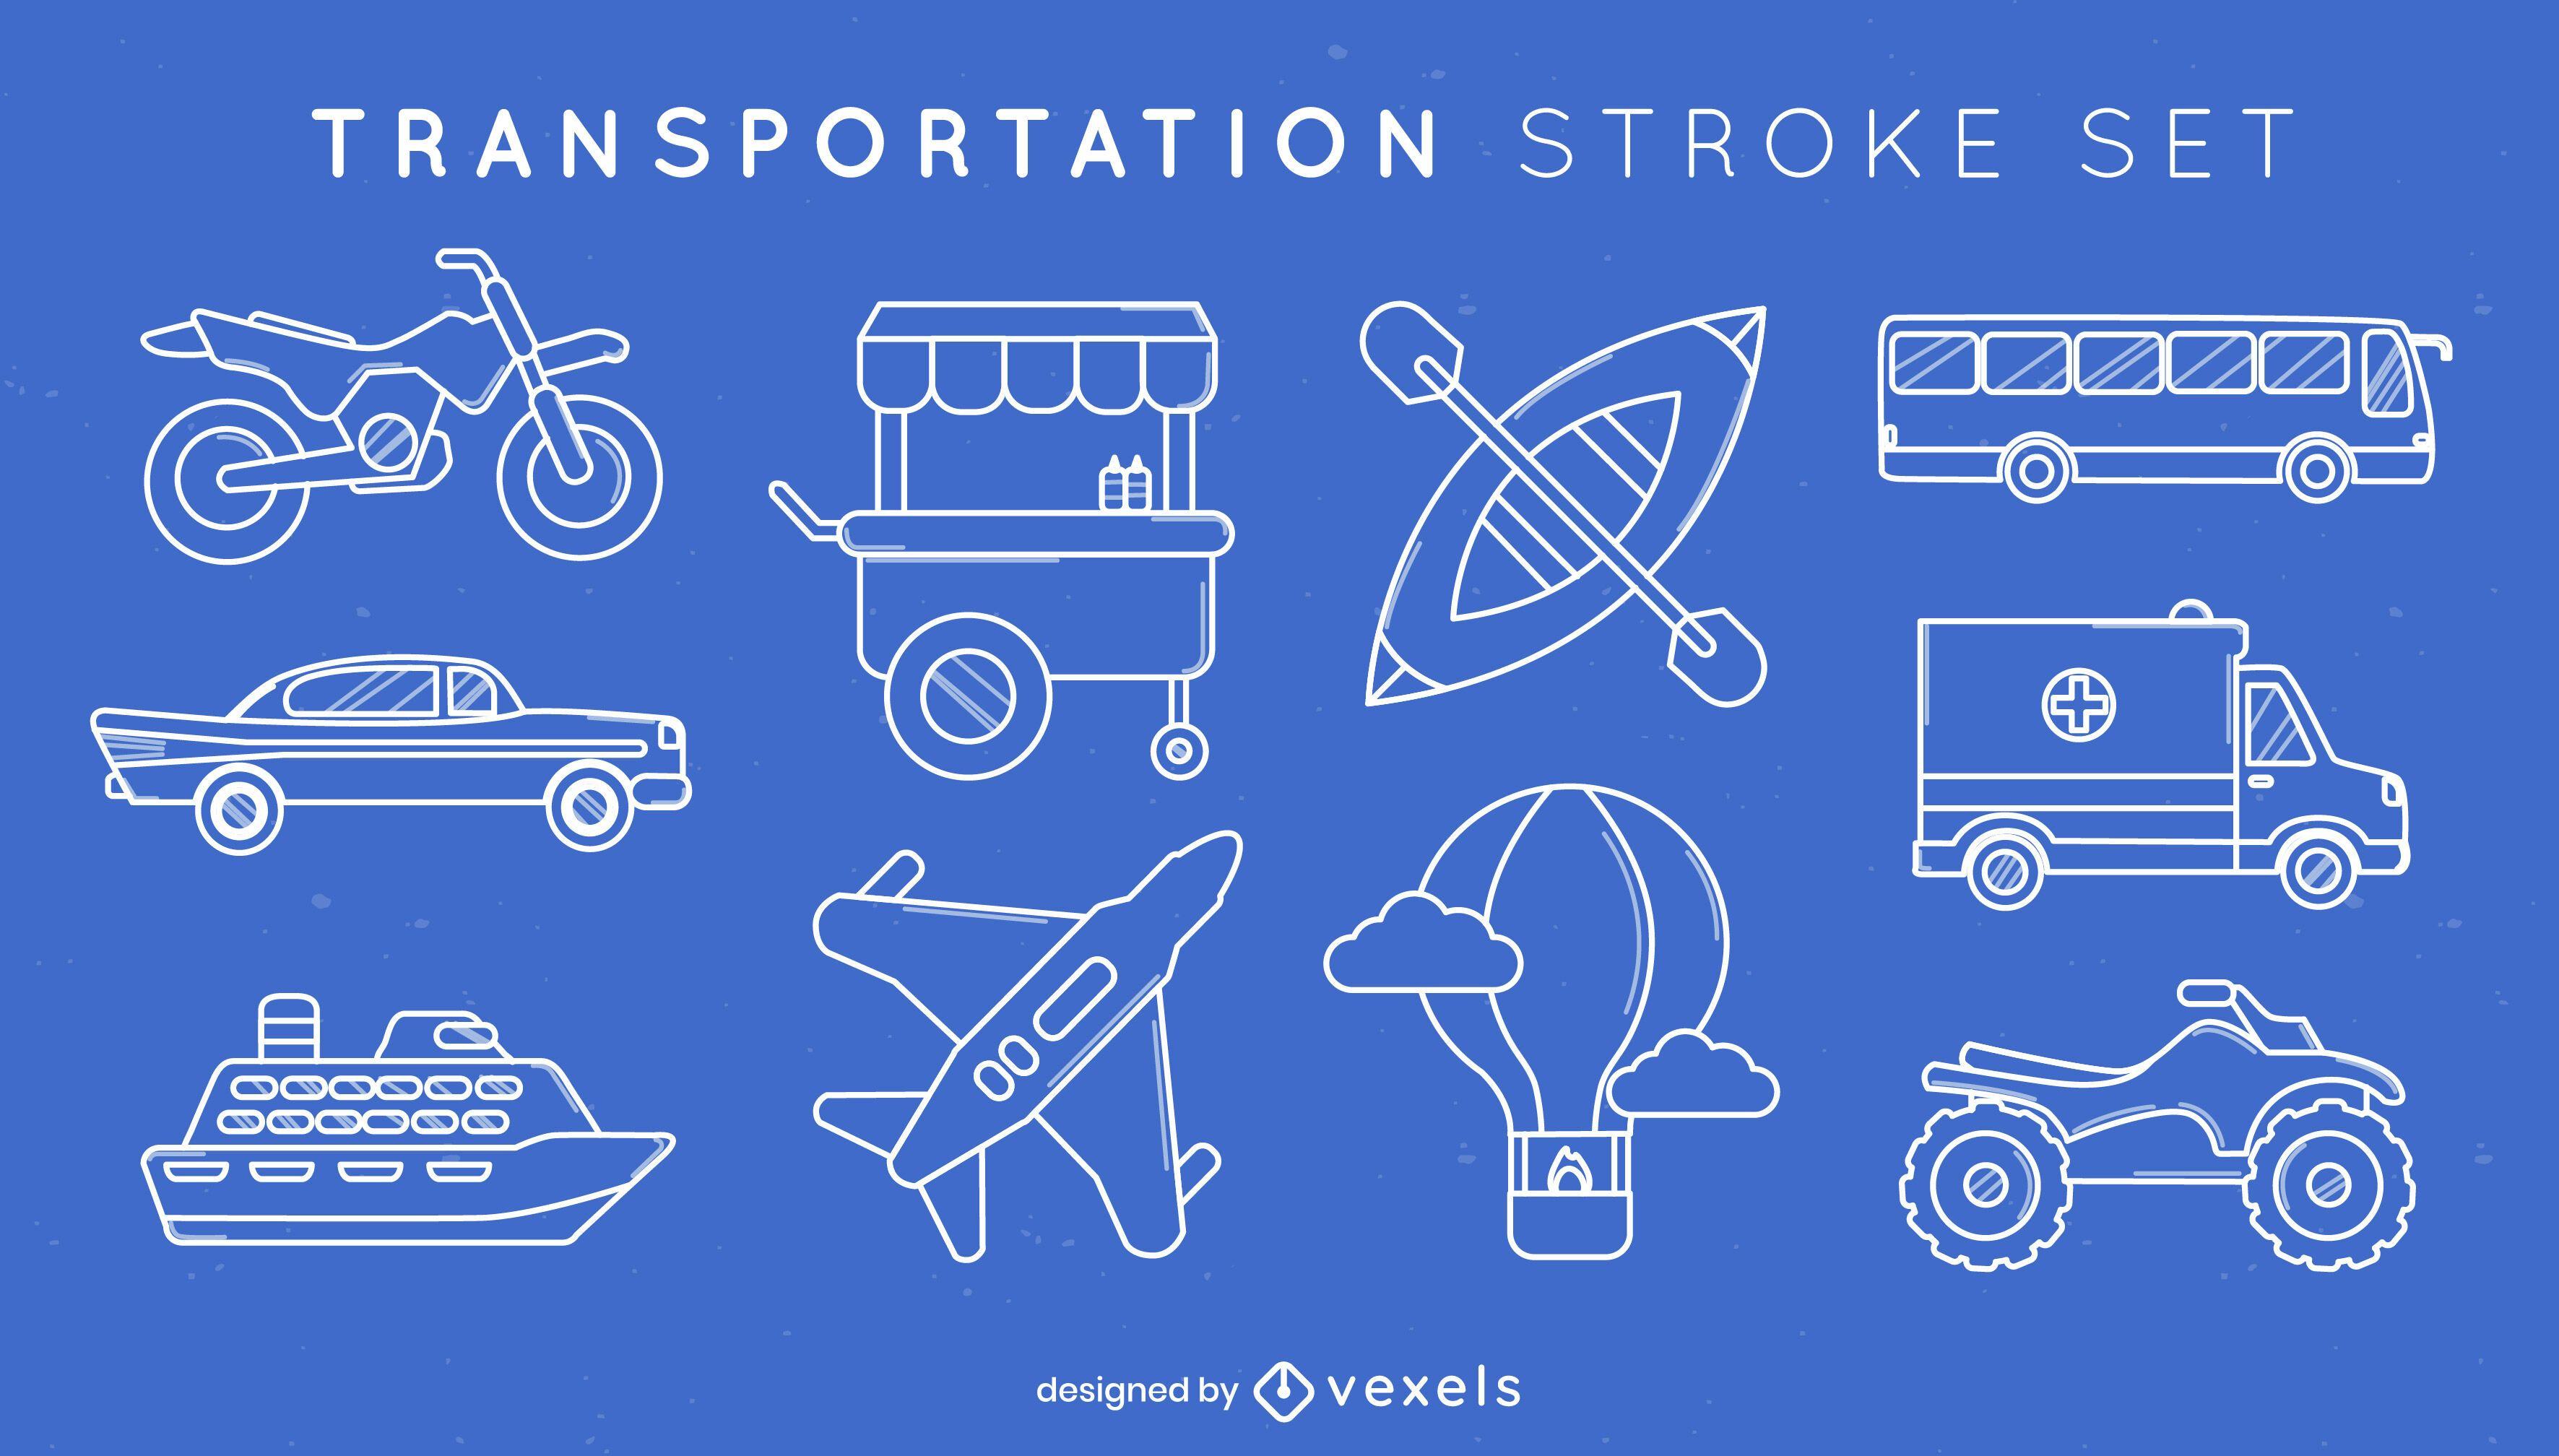 Stroke set of vehicles